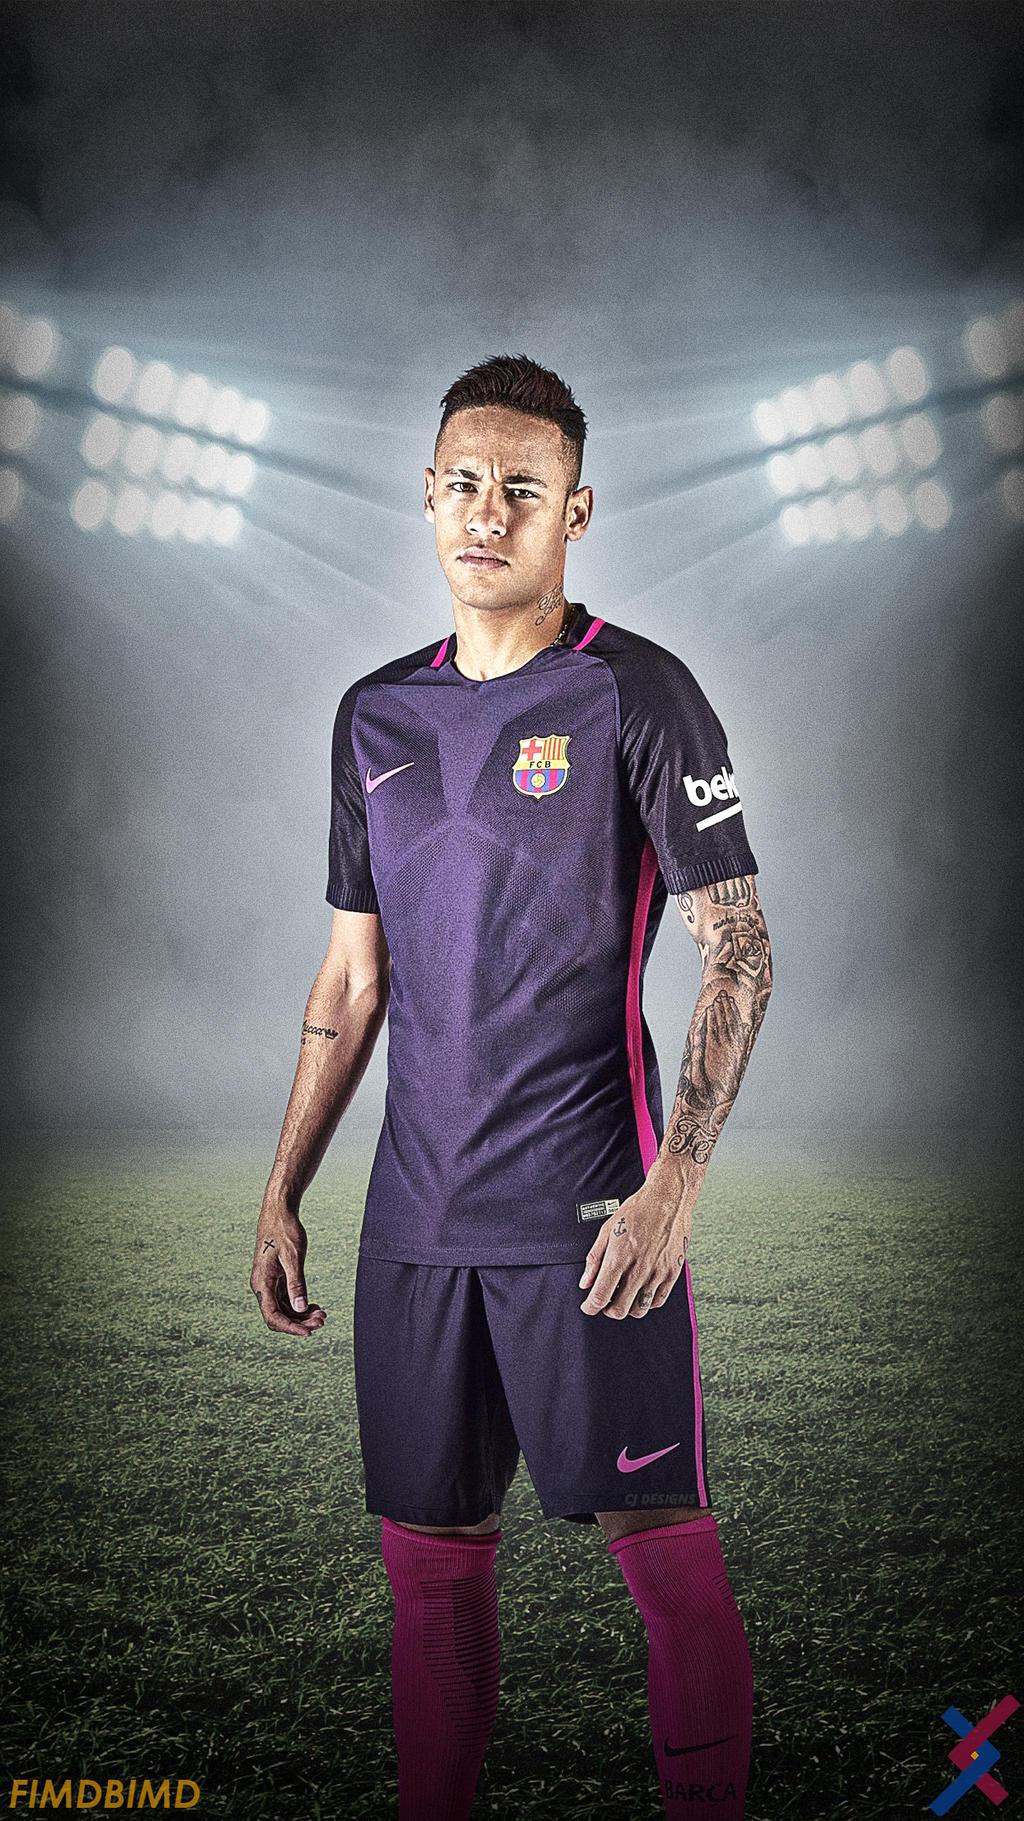 reputable site 1dc85 abb49 Neymar Jr. New FCB kit by CjDesigns5 on DeviantArt